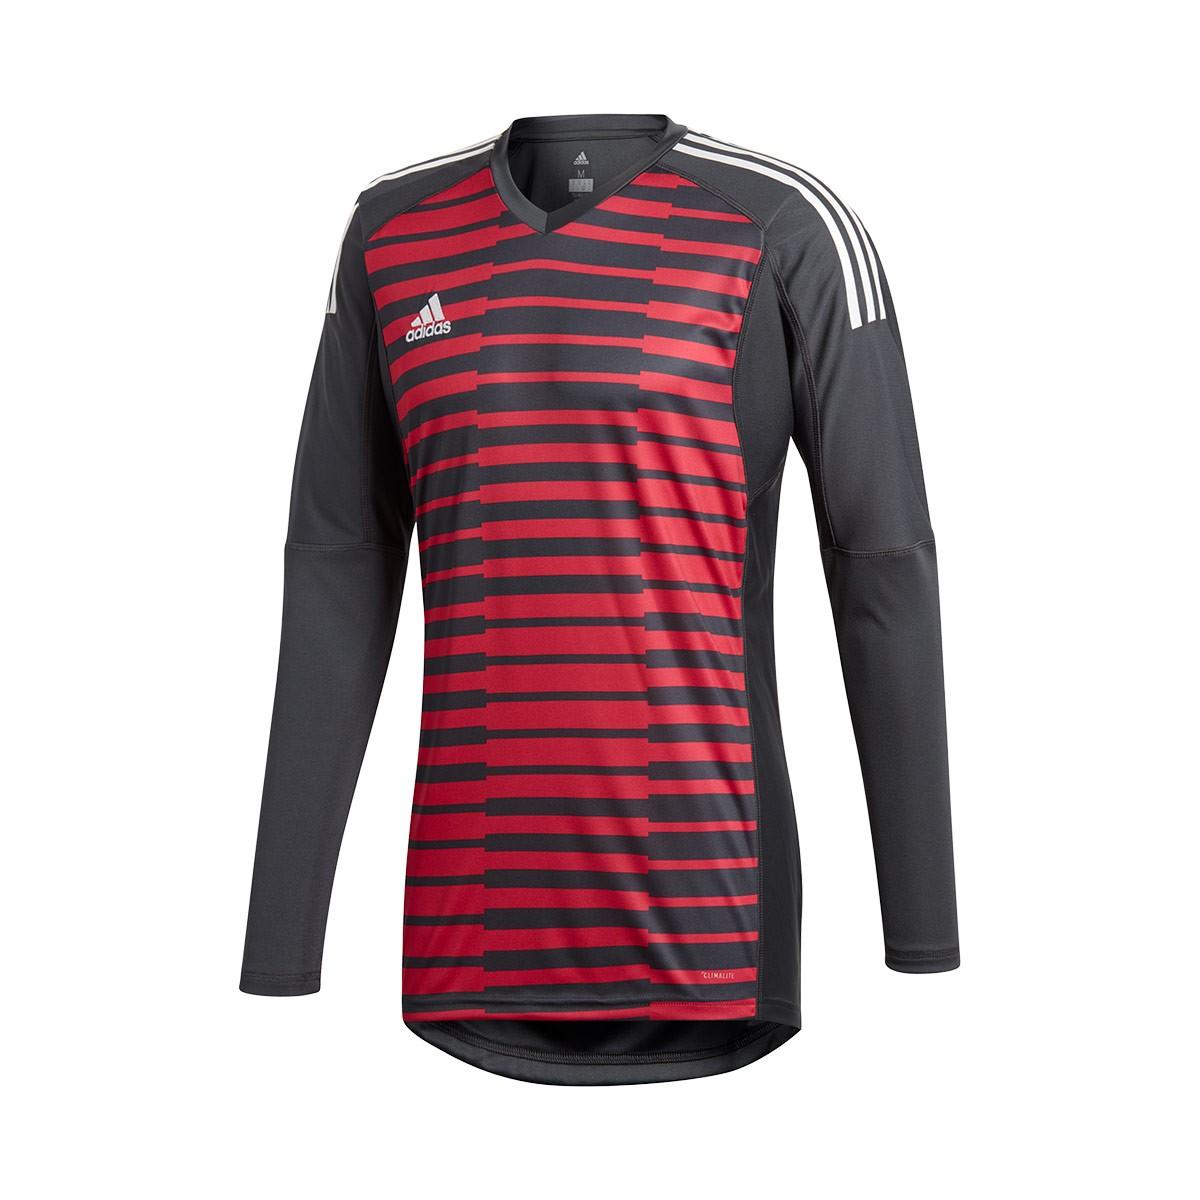 d9d41ef443a Jersey adidas AdiPro 18 Goalkeeper Longsleeve Dark grey-Unity pink-White -  Football store Fútbol Emotion